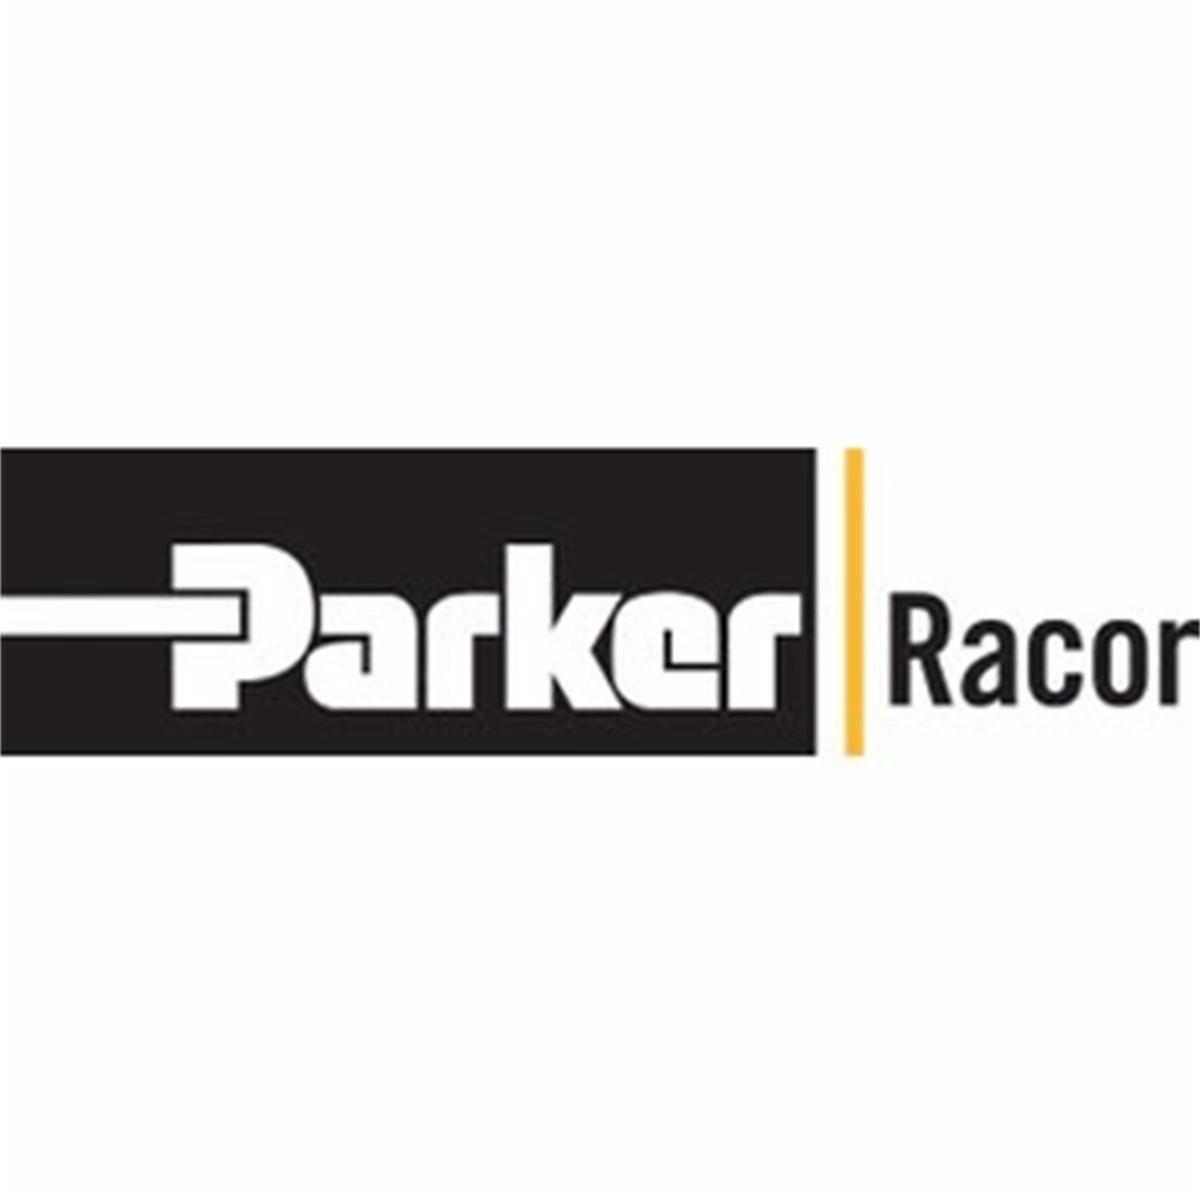 hight resolution of d r k00391 thumbnail0 29 new parker racor logo croped 5 10946017 thumbnail0